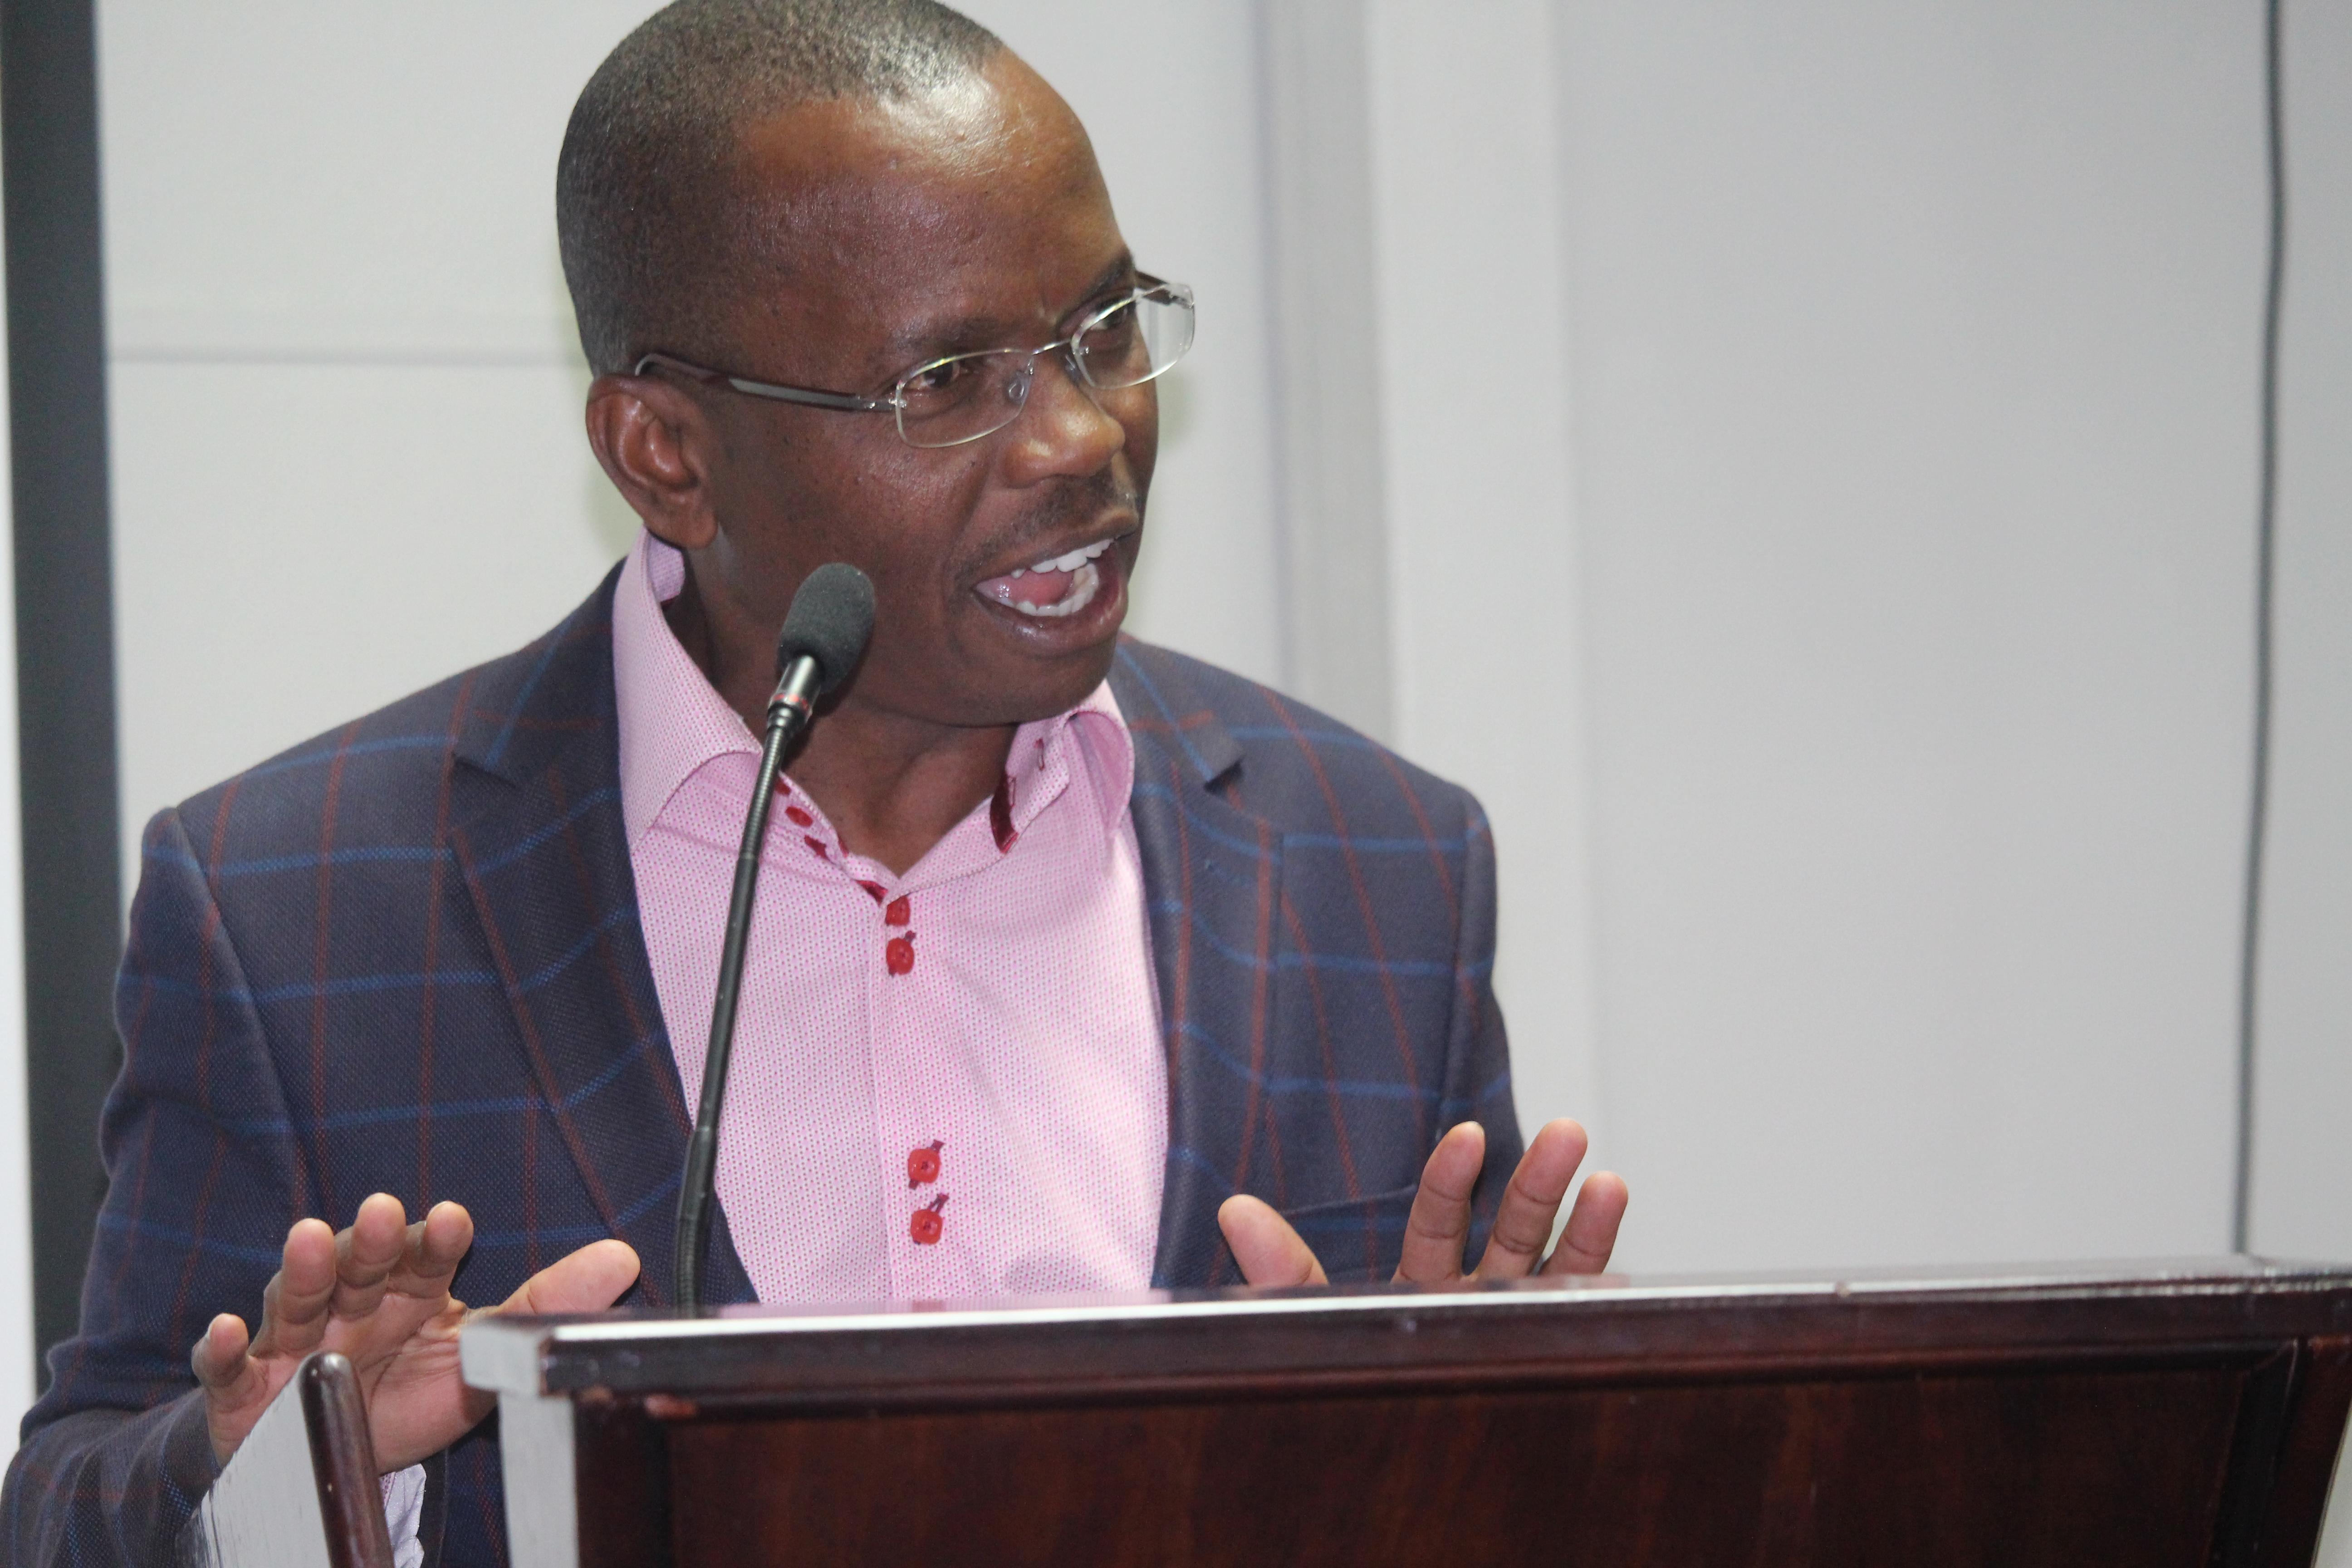 www. δωρεάν γκέι dating σε Χαράρε Ζιμπάμπουε αγάπη λωρίδα-mamamoo γάμος δεν χρονολογείται ost μέρος 2